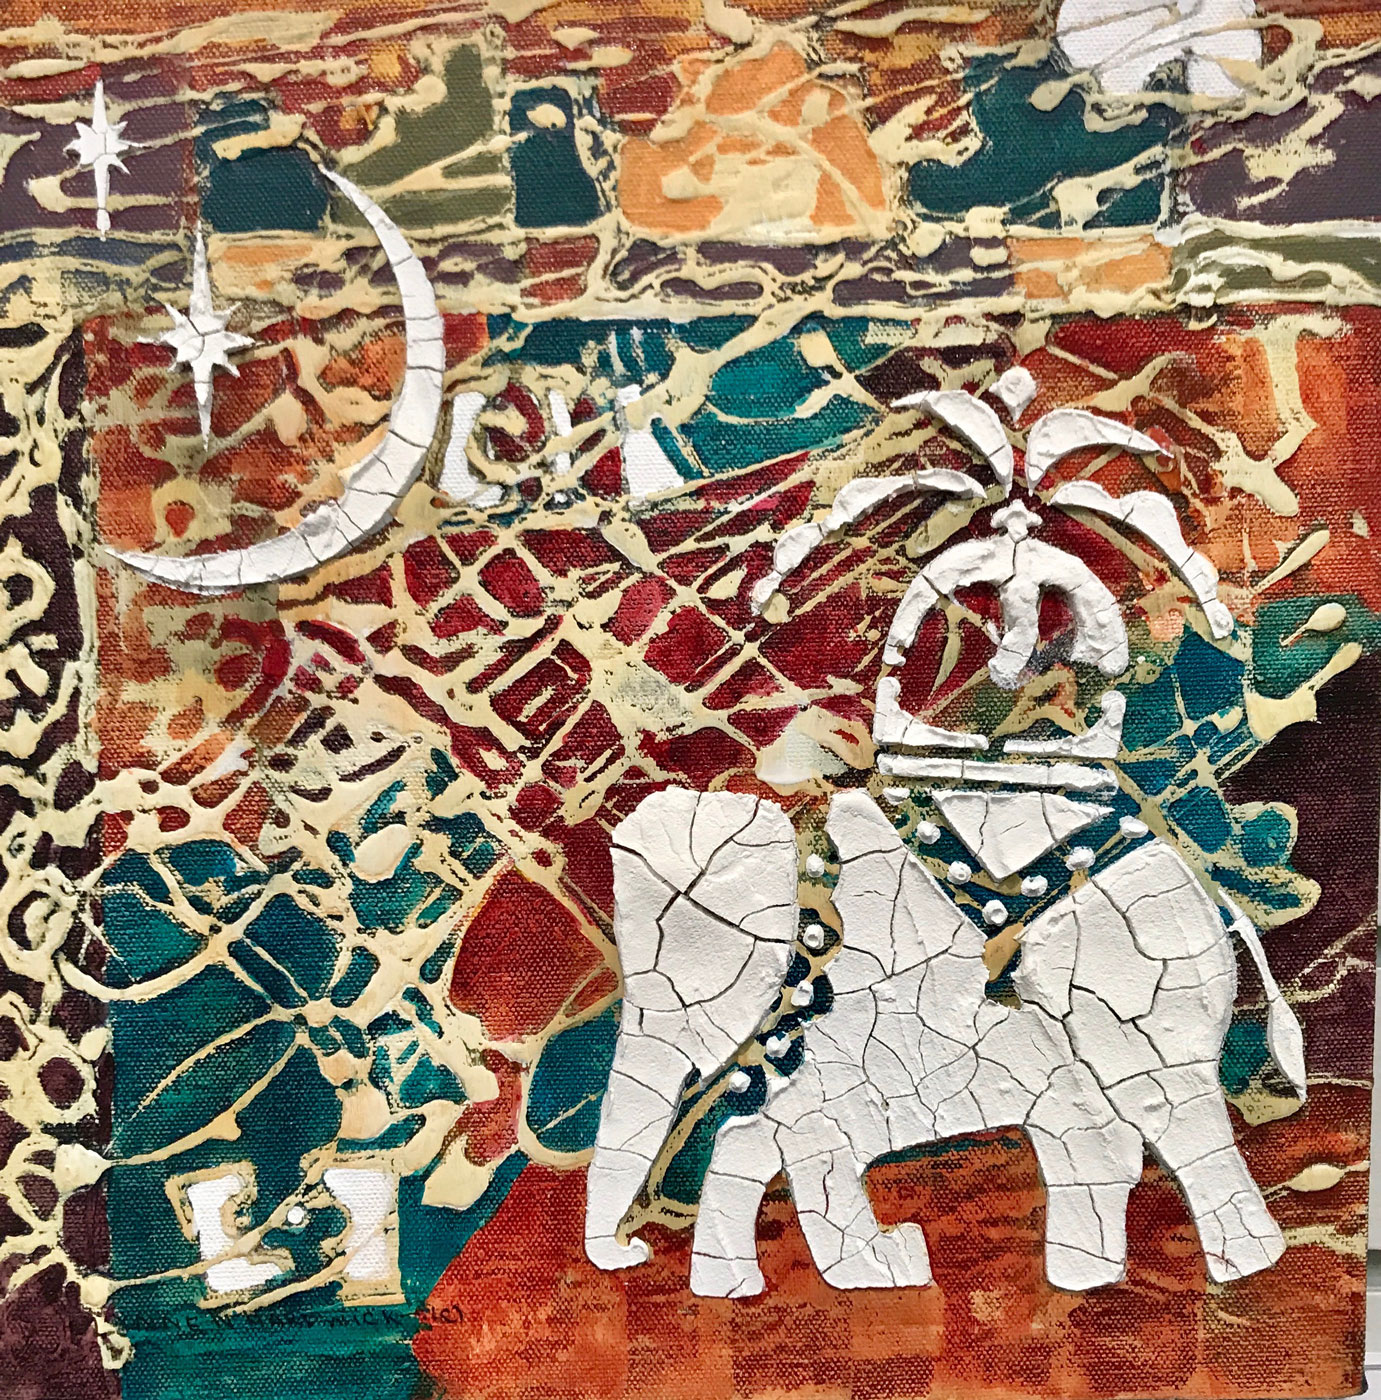 Lynne Hardwick, Abstract Mixed Media, Ayutthaya